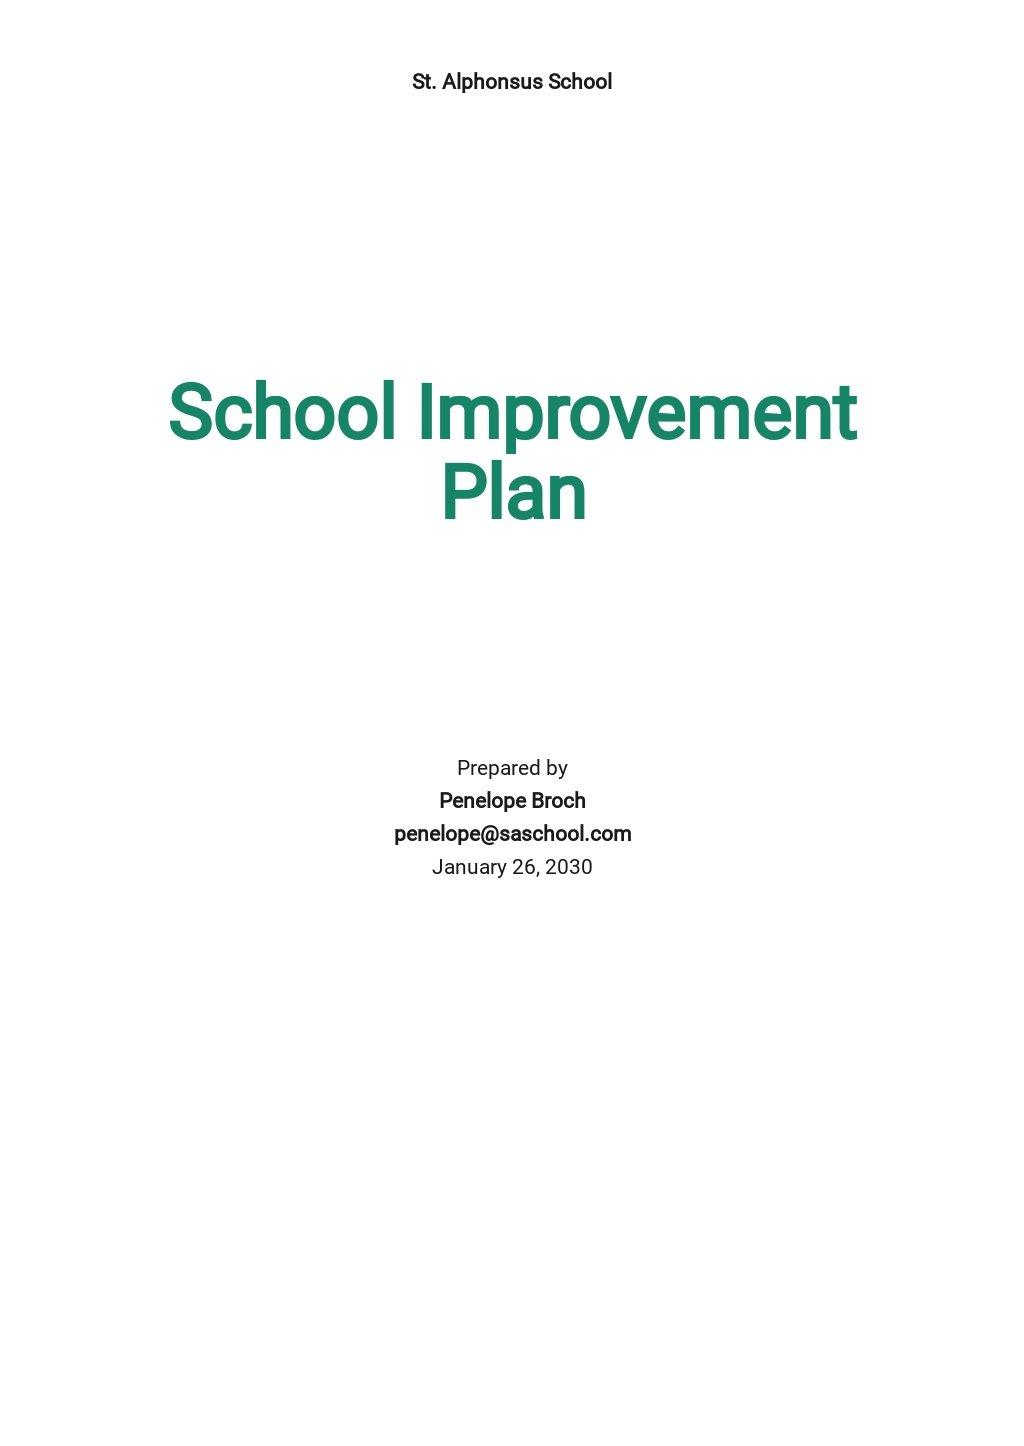 School Improvement Plan Template